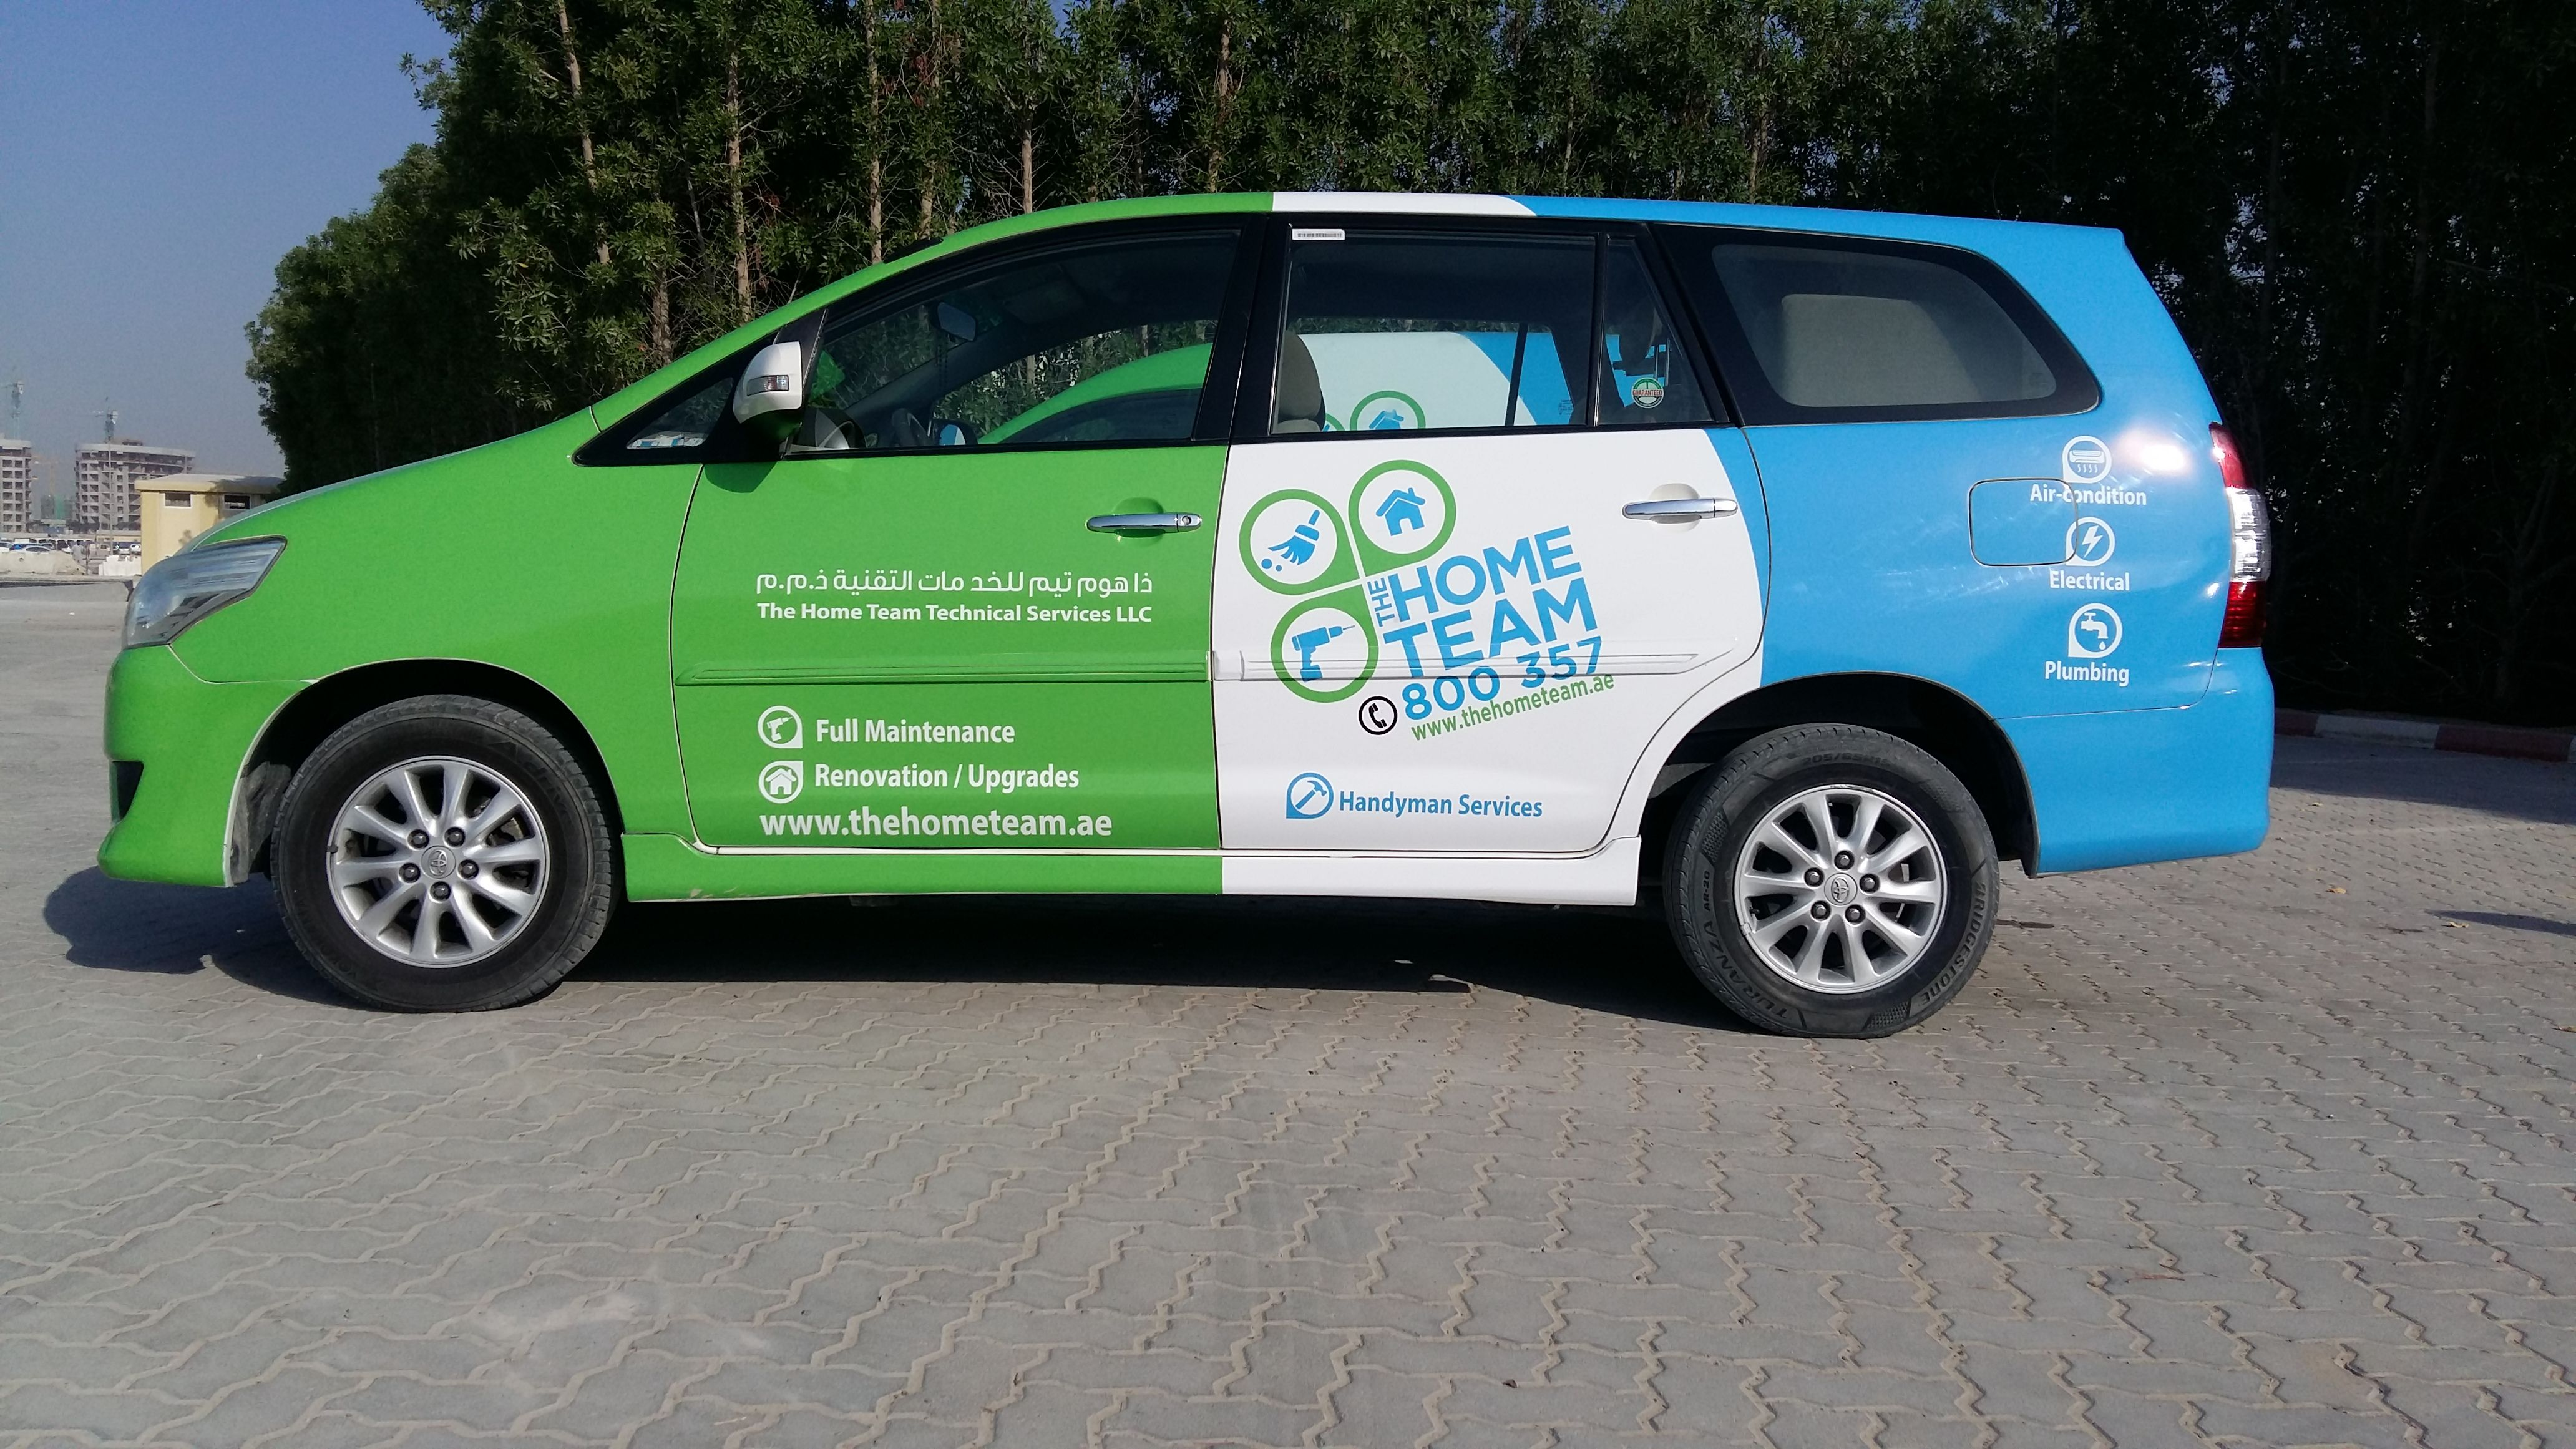 Vehicle Branding Car Stickers Bus Wrapping Vehicle Advertisement In Dubai Car Brands Car Stickers Vinyl Wrap Car [ 2322 x 4128 Pixel ]